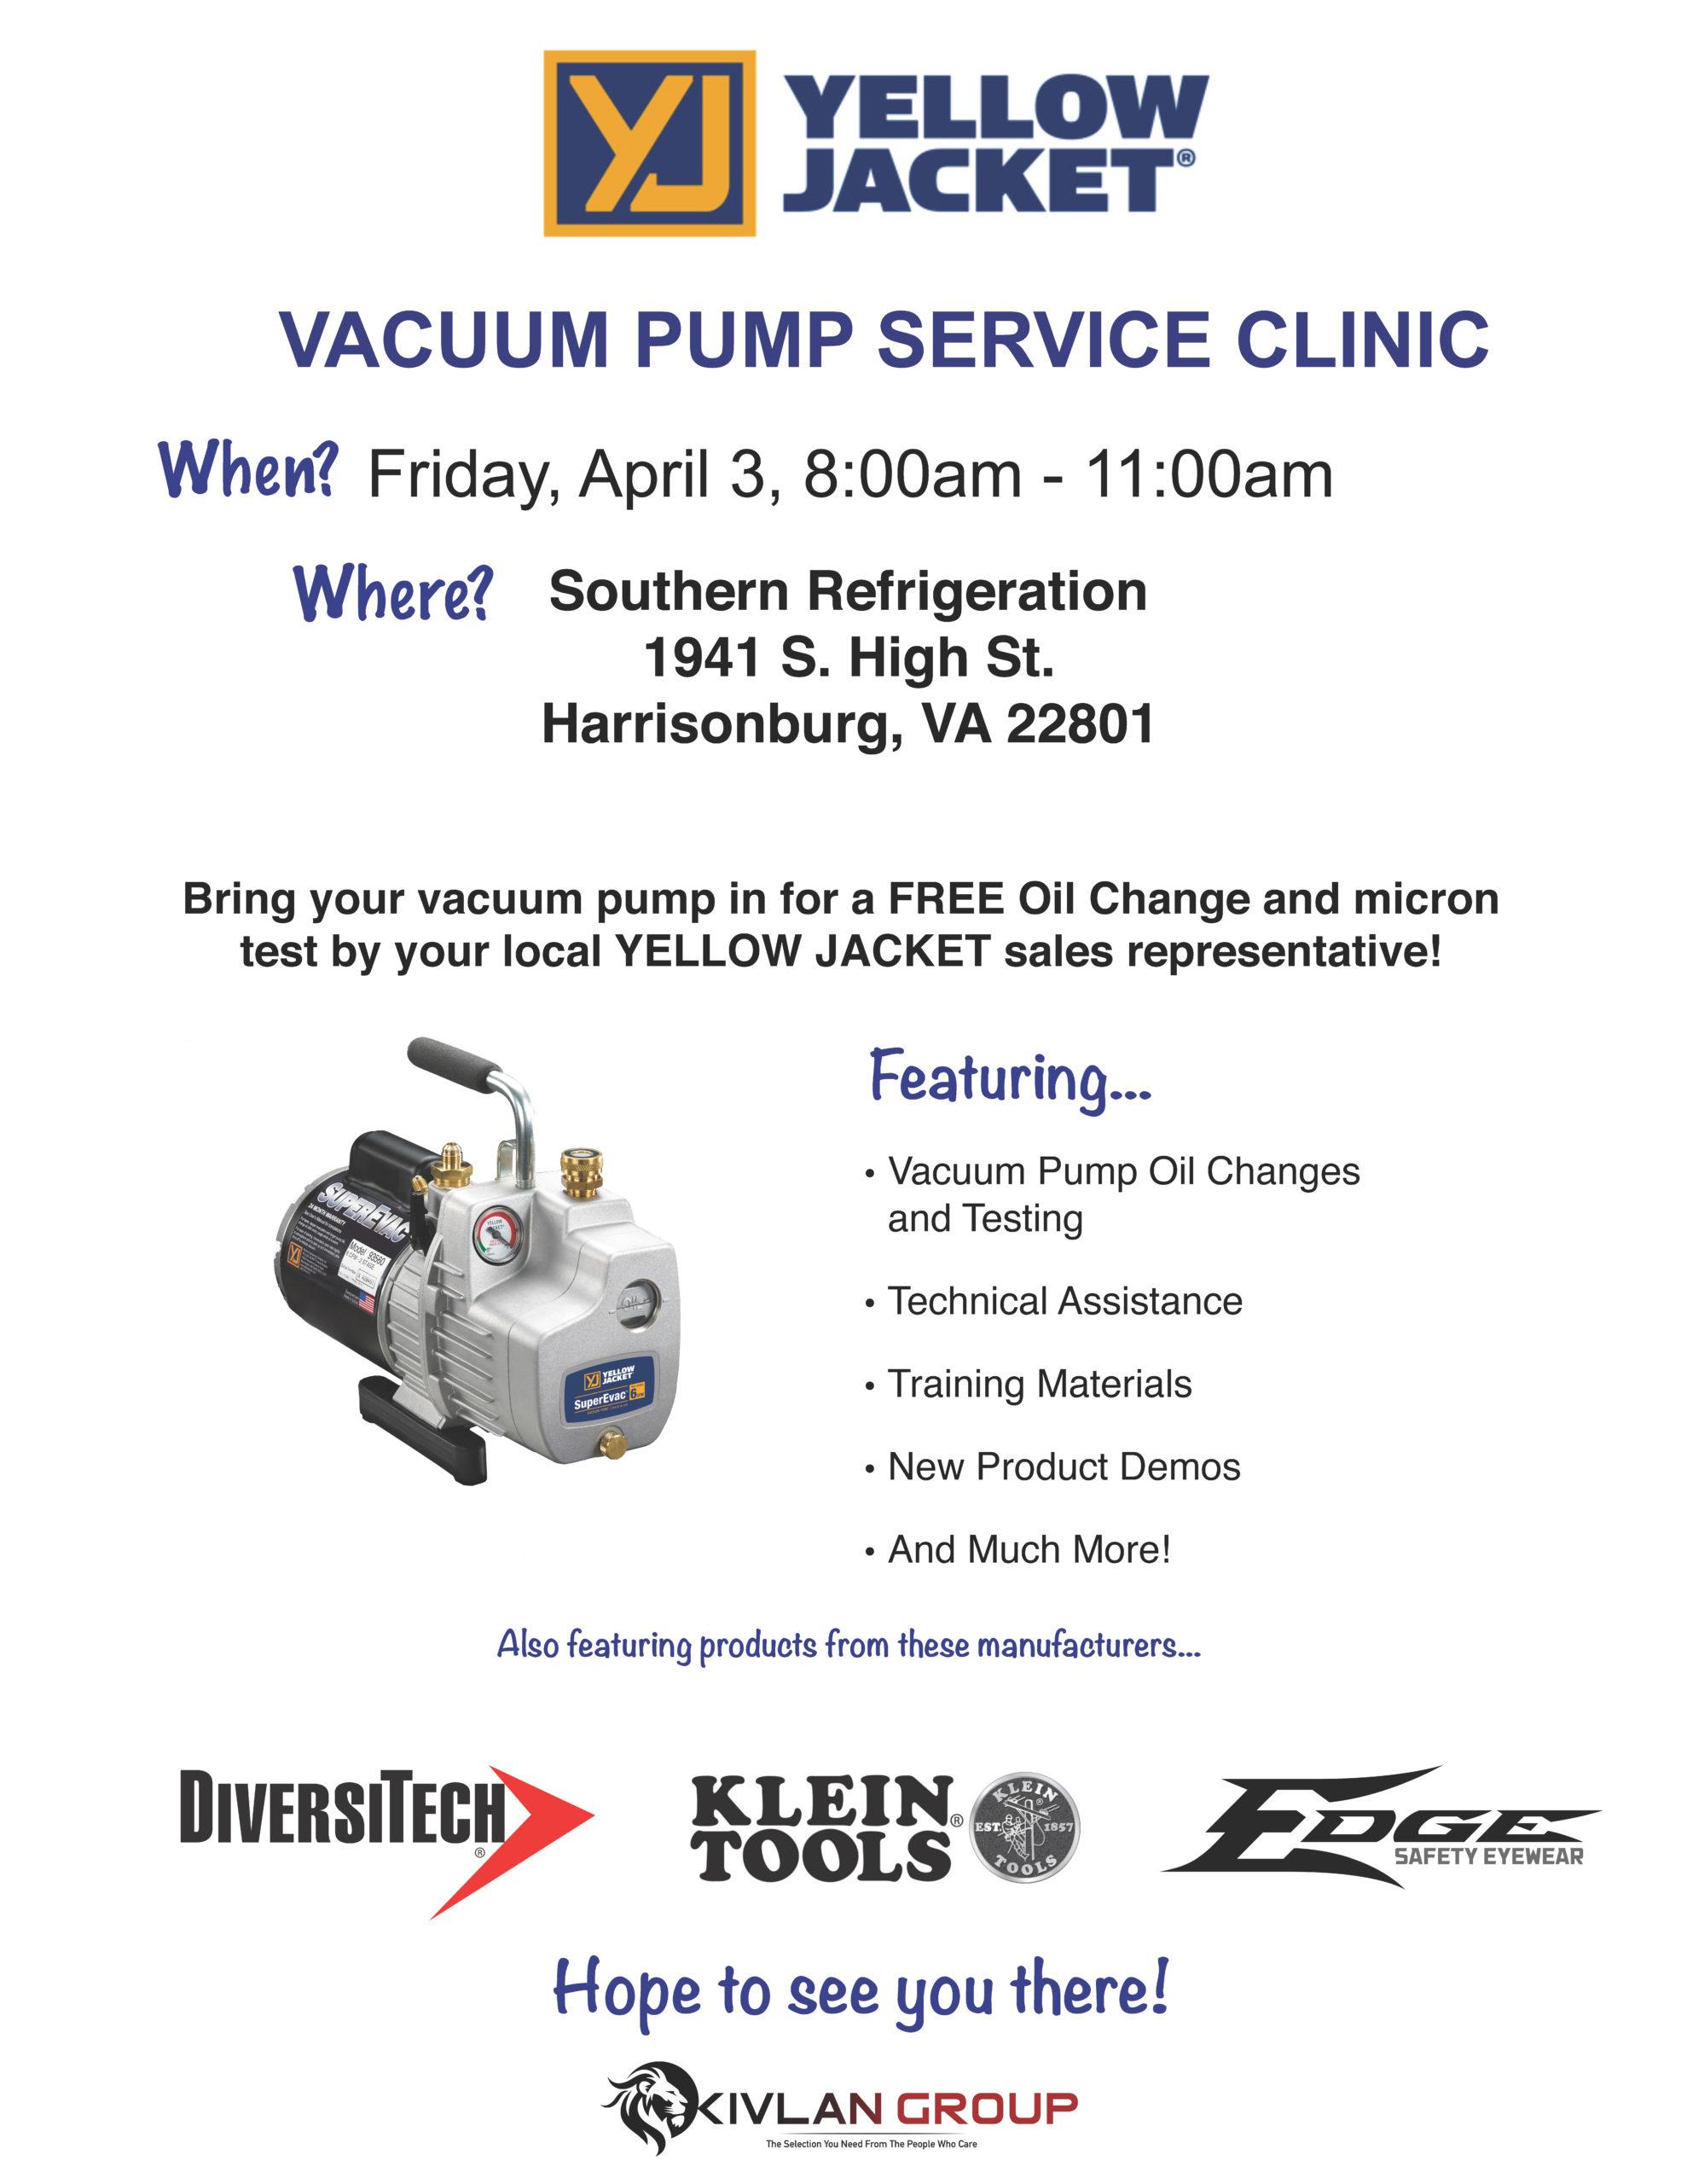 Yellow Jacket Vacuum Pump Service – Harrisonburg @ Southern Refrigeration - Harrisonburg